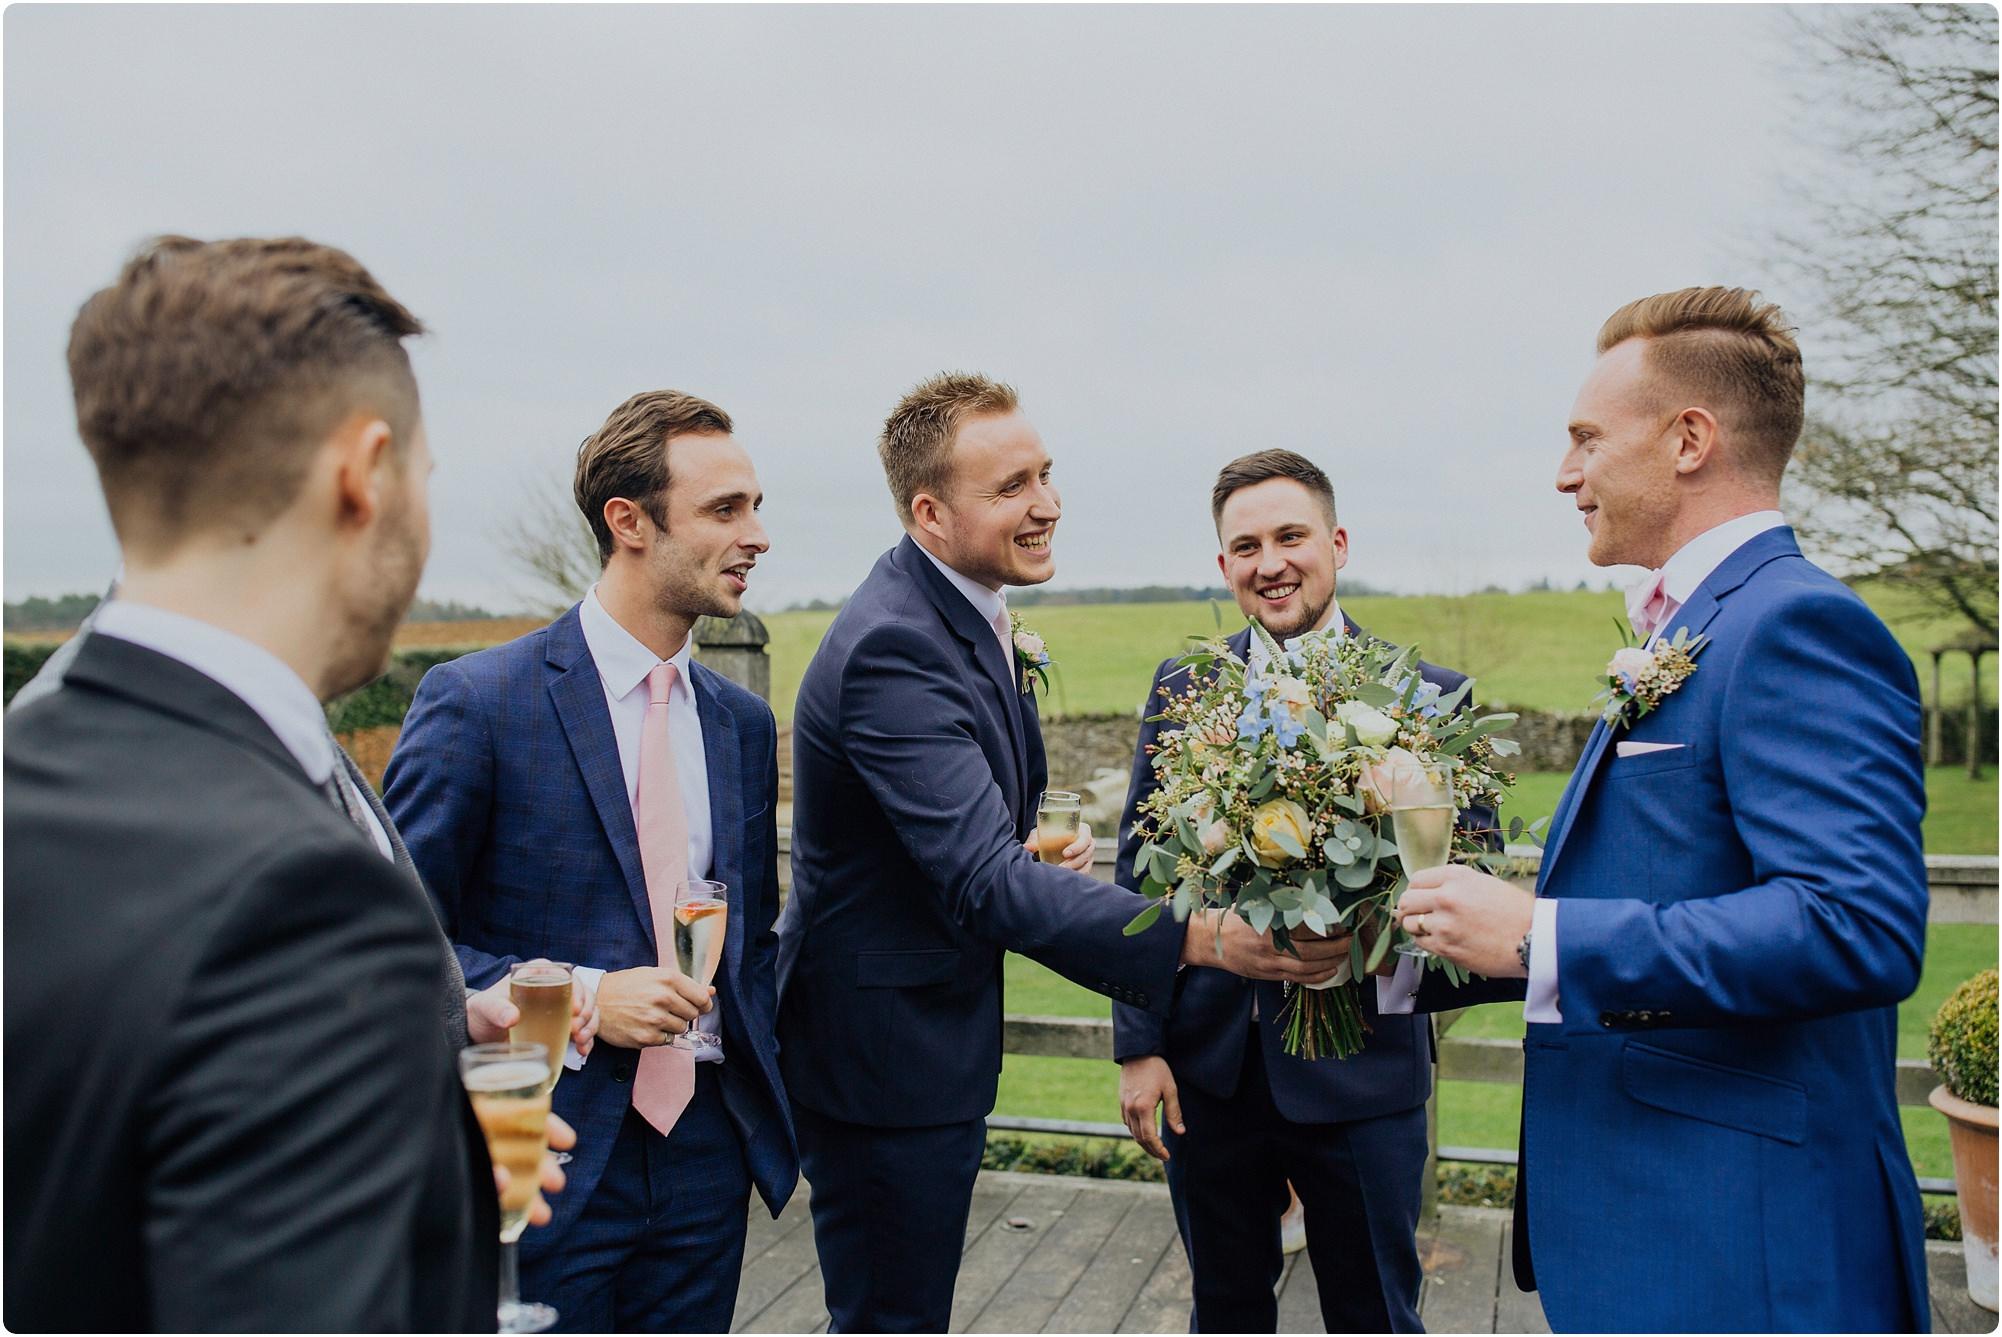 friends congratulating the groom at a Cripps Barn Winter Wedding